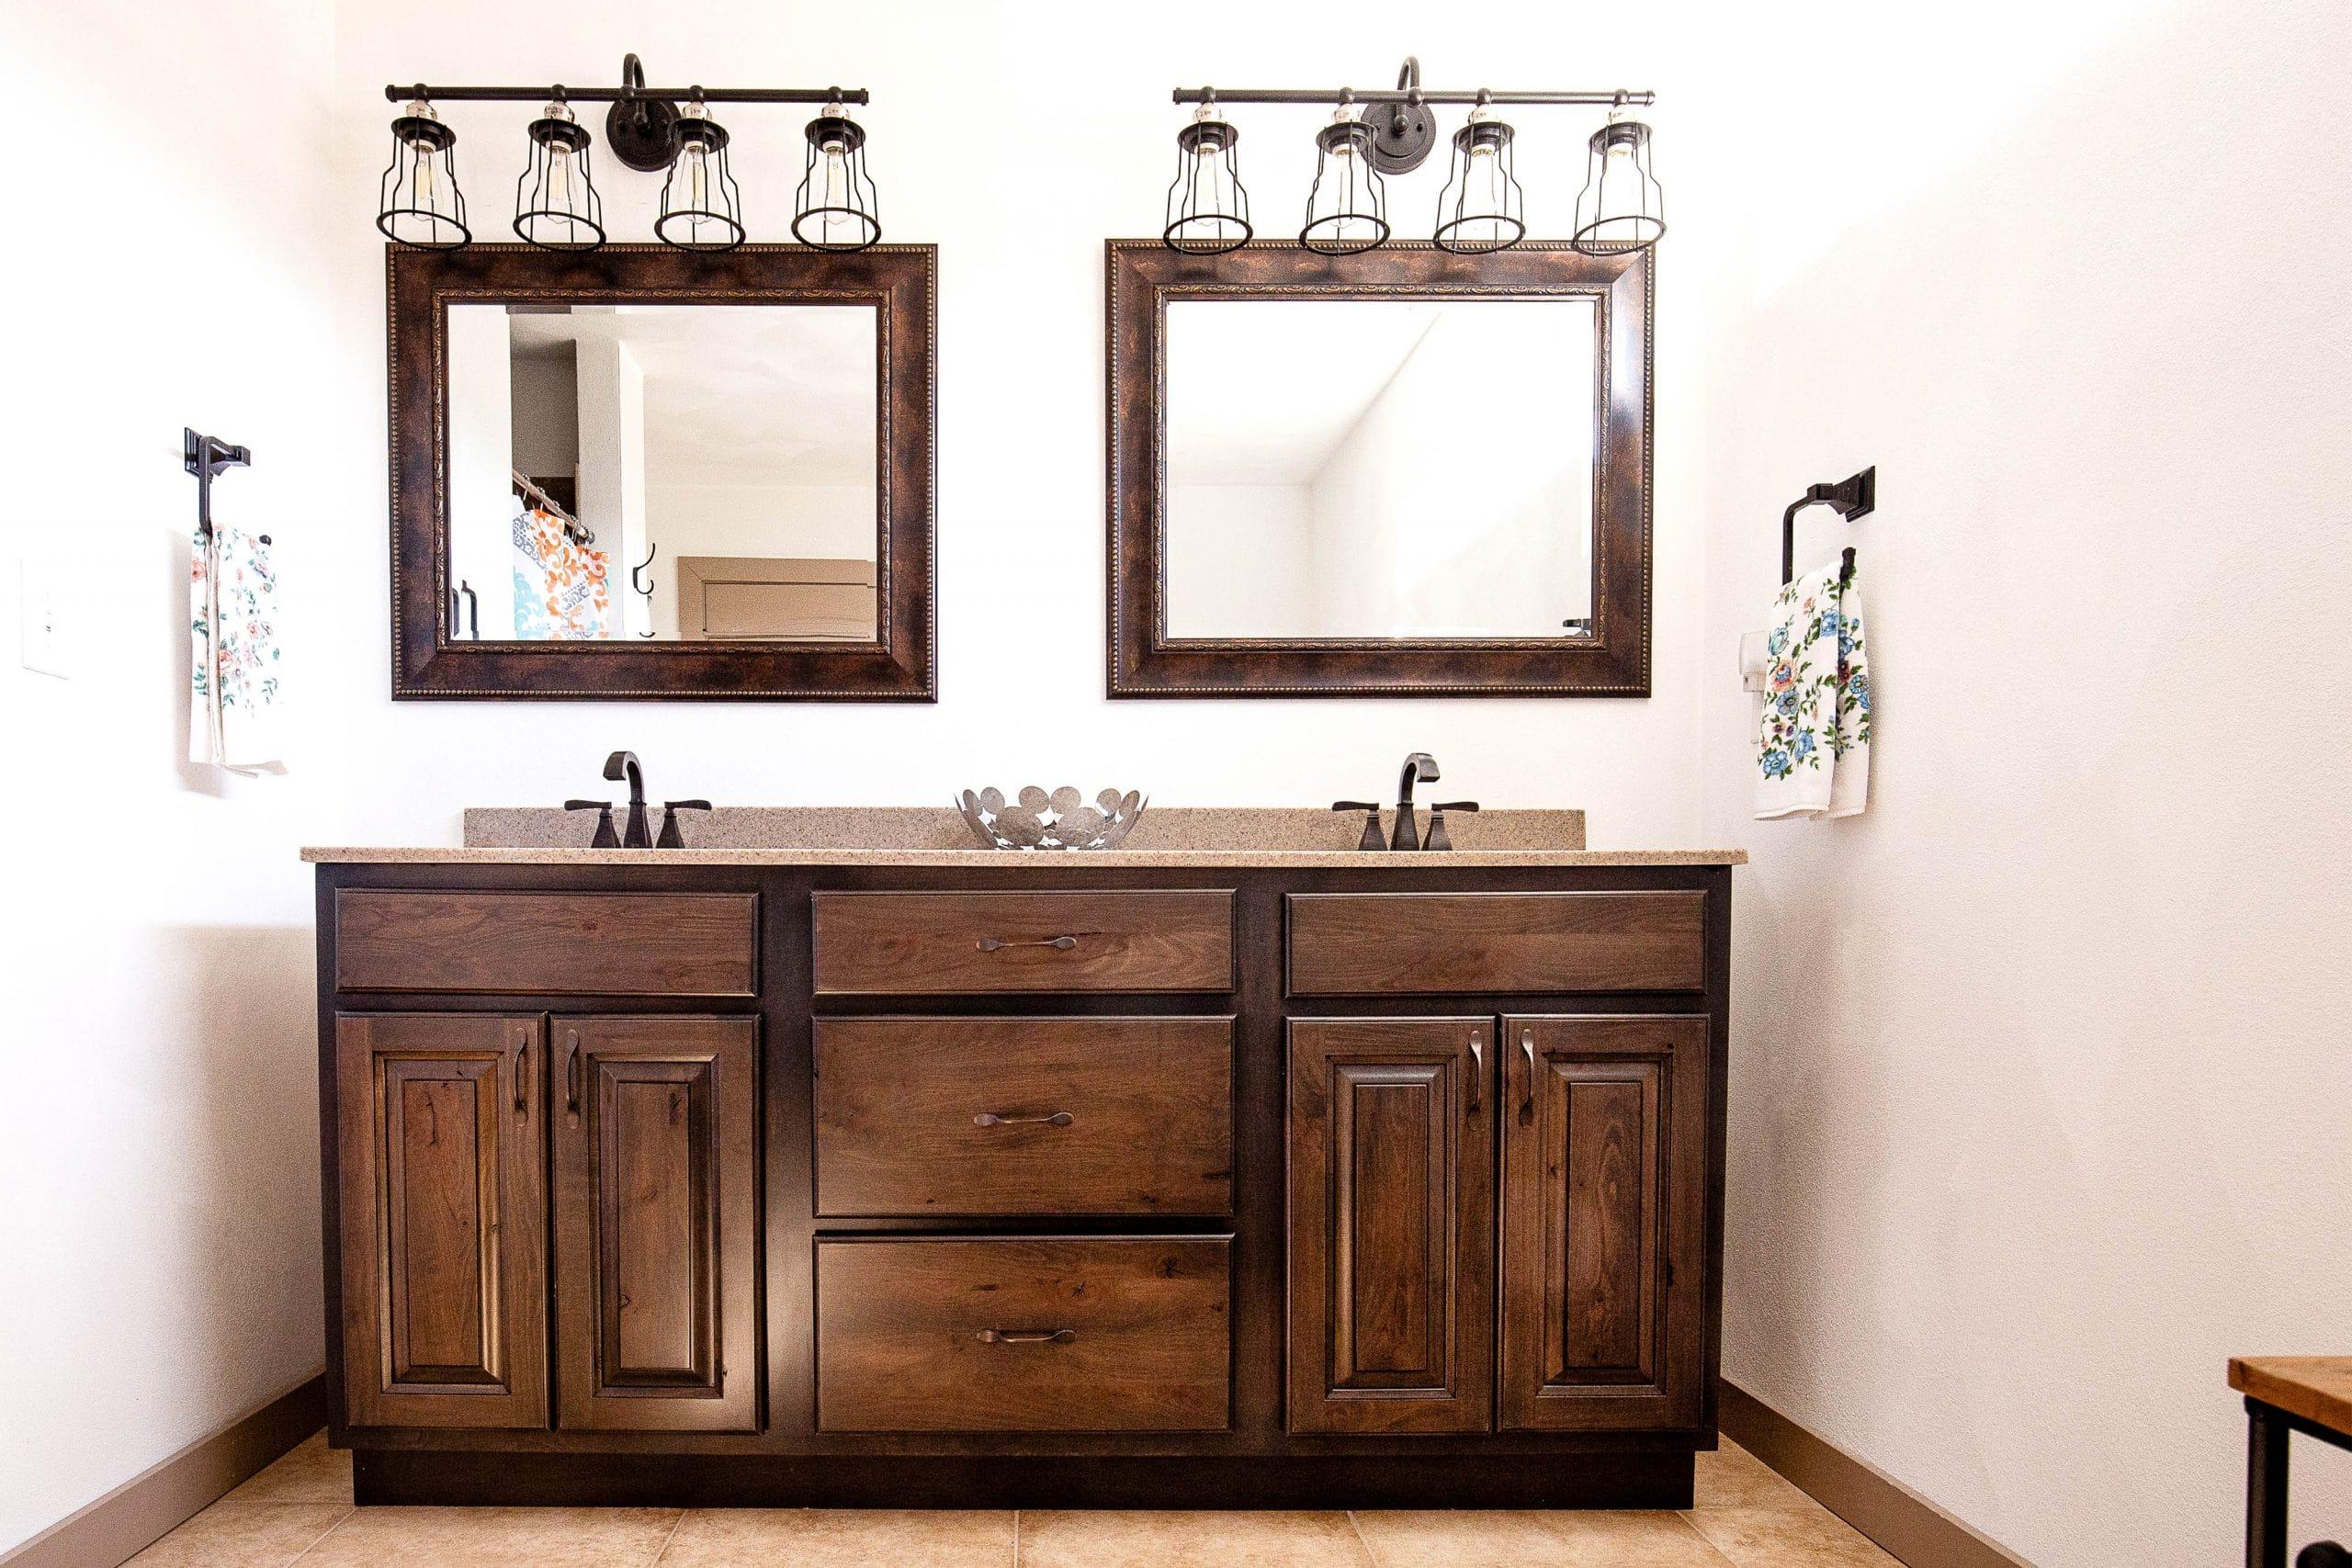 Custom Bathrooms | Studio 11 Cabinets & Design